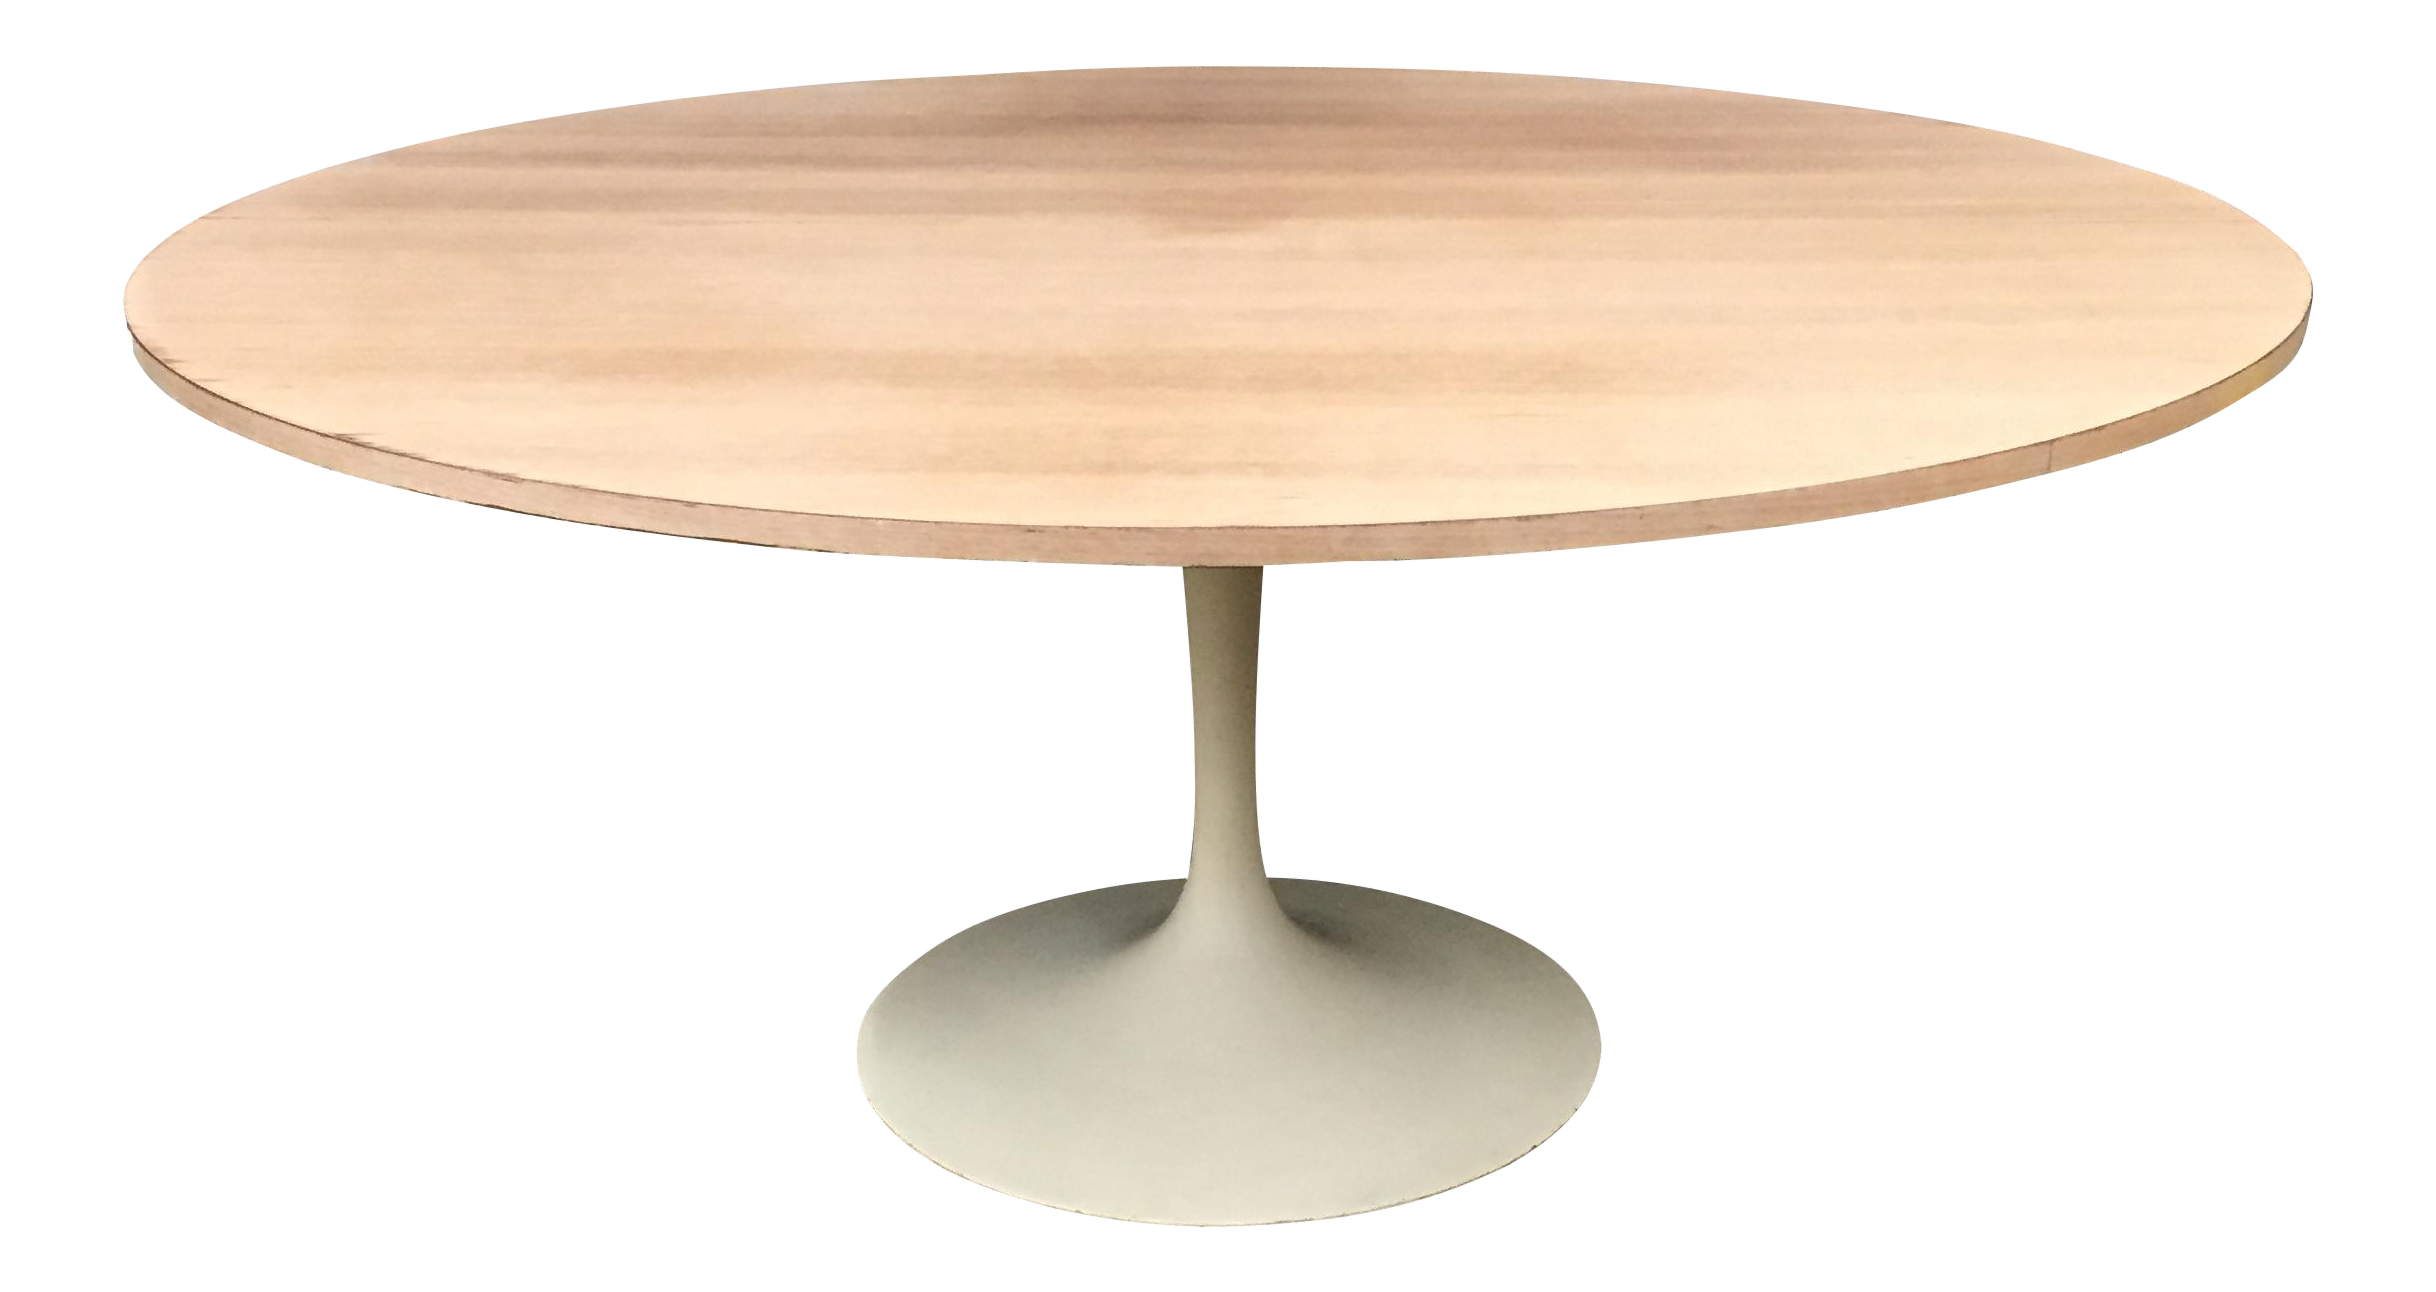 Wonderful Original Knoll Eero Saarinen Tulip Table